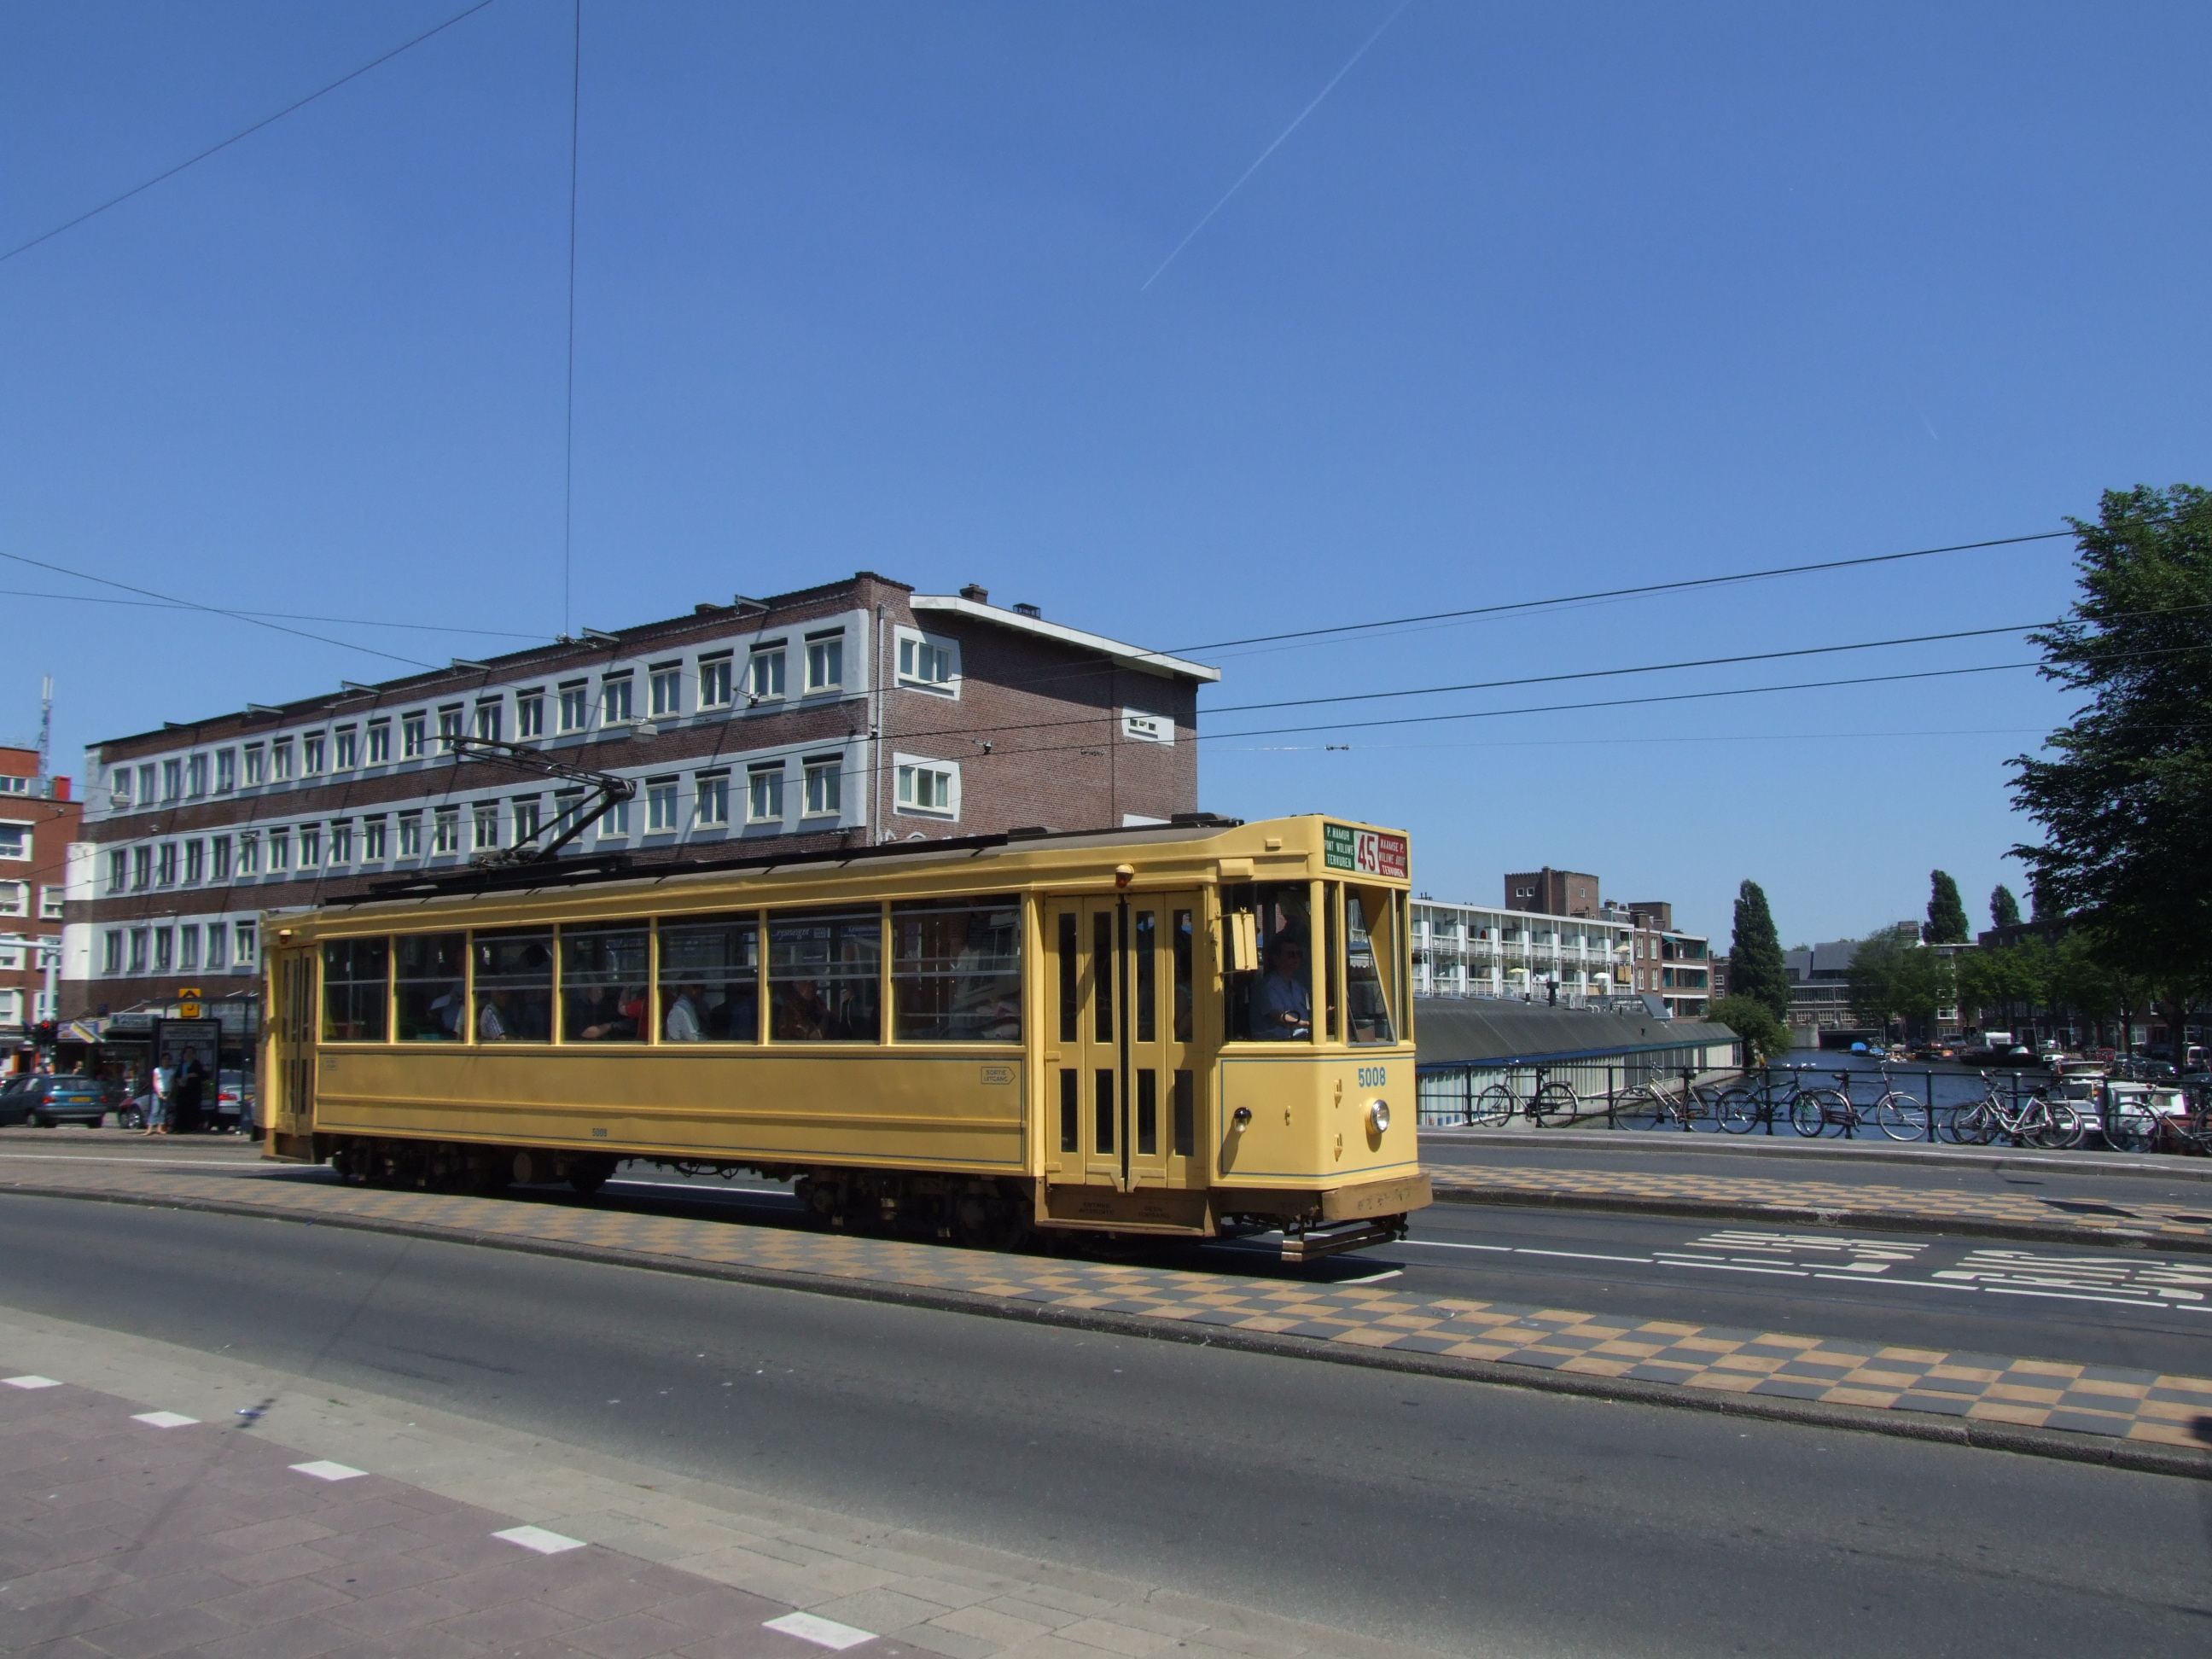 38: Also the back of Tram 1024 is nice tor see. (Den Haag) Hoofdweg.